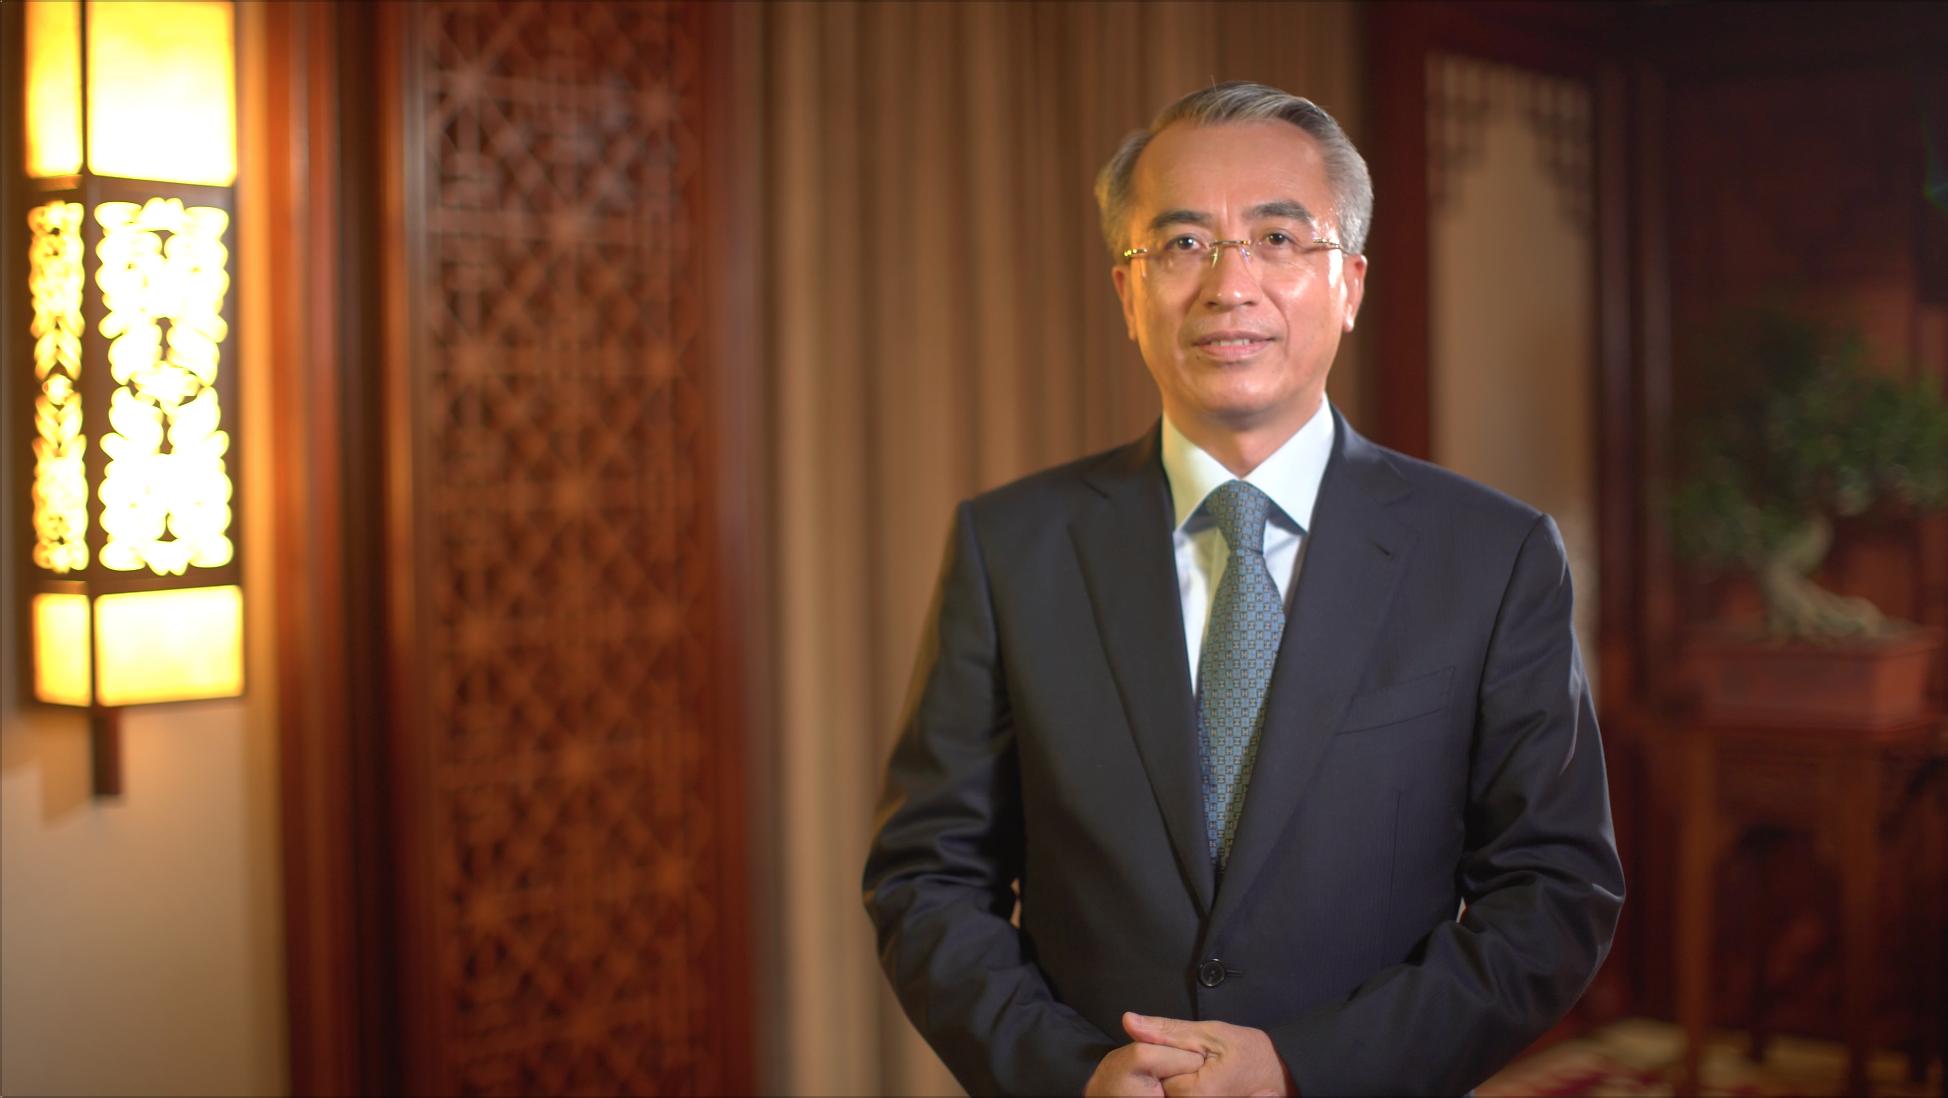 Mr. Cai was filmed standing.